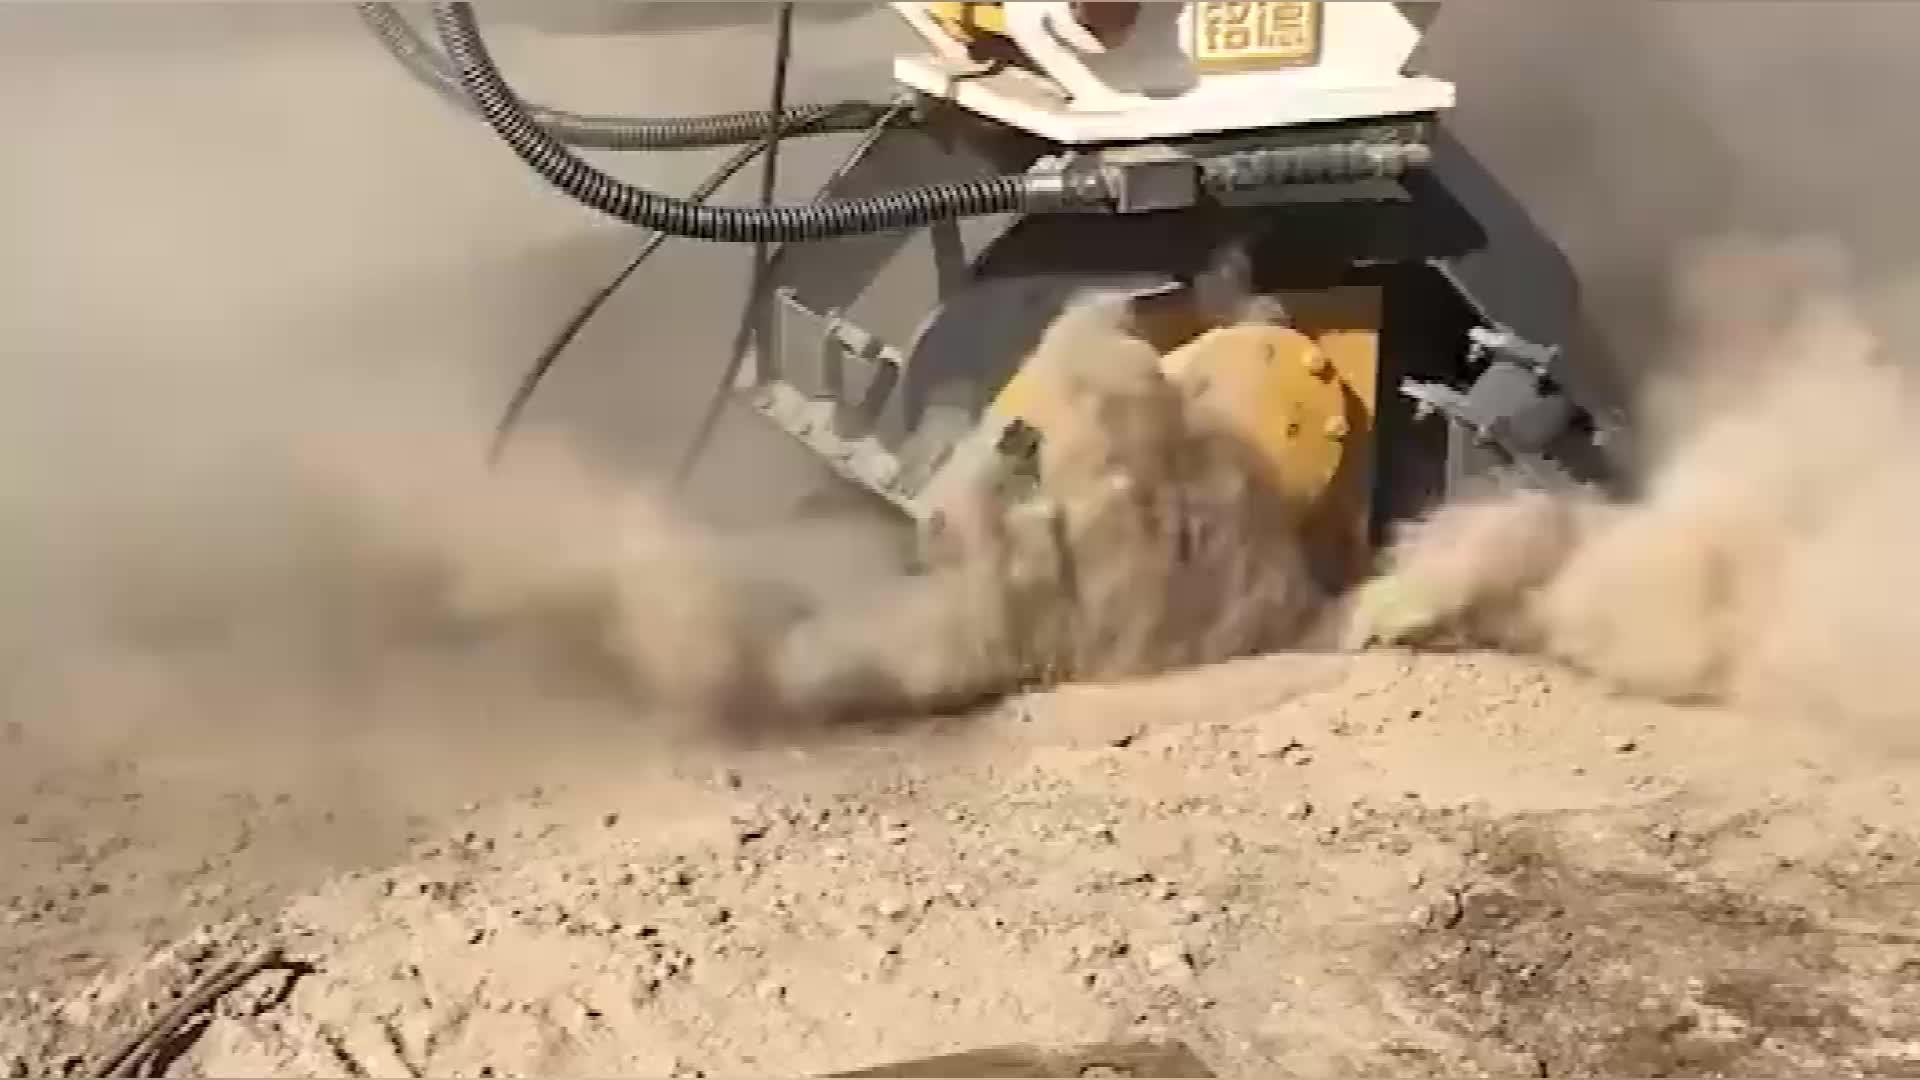 7-30T Excavatorอะไหล่อัดแผ่น